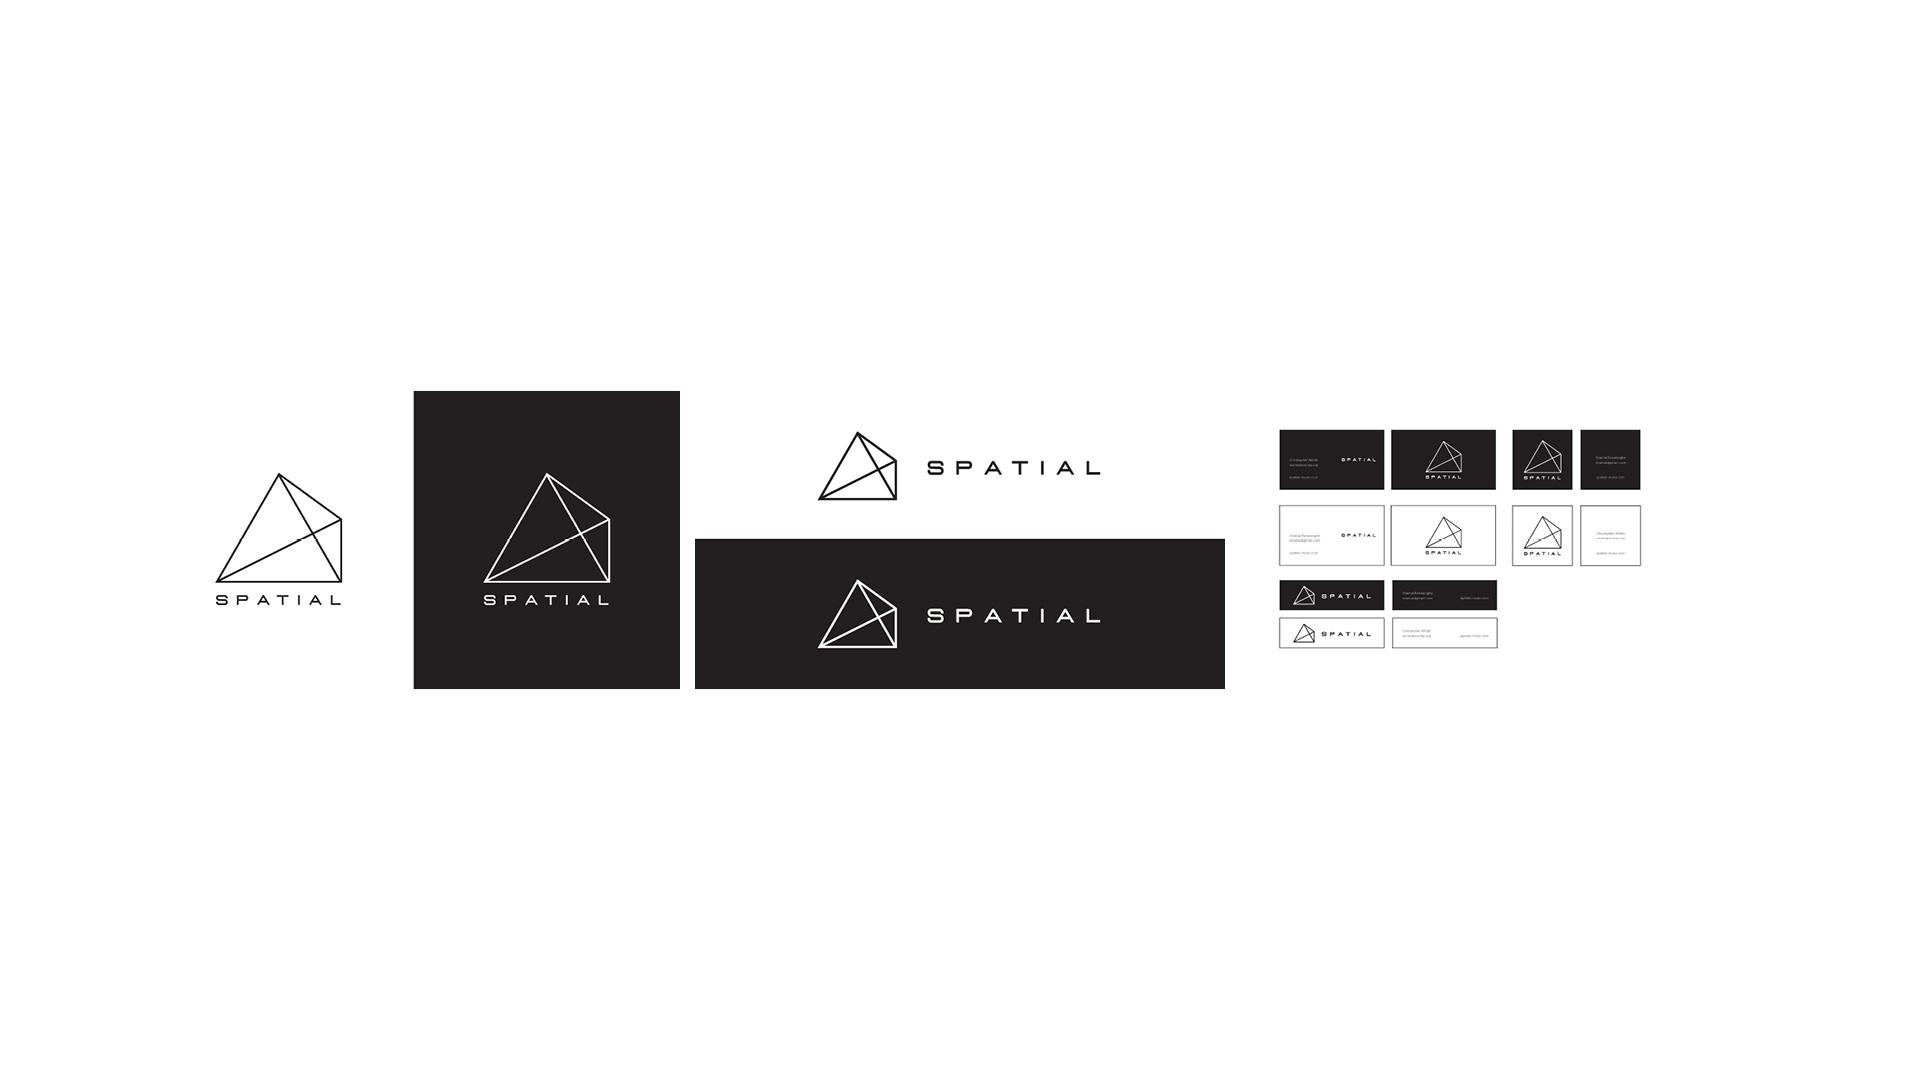 (for Spatial branding)